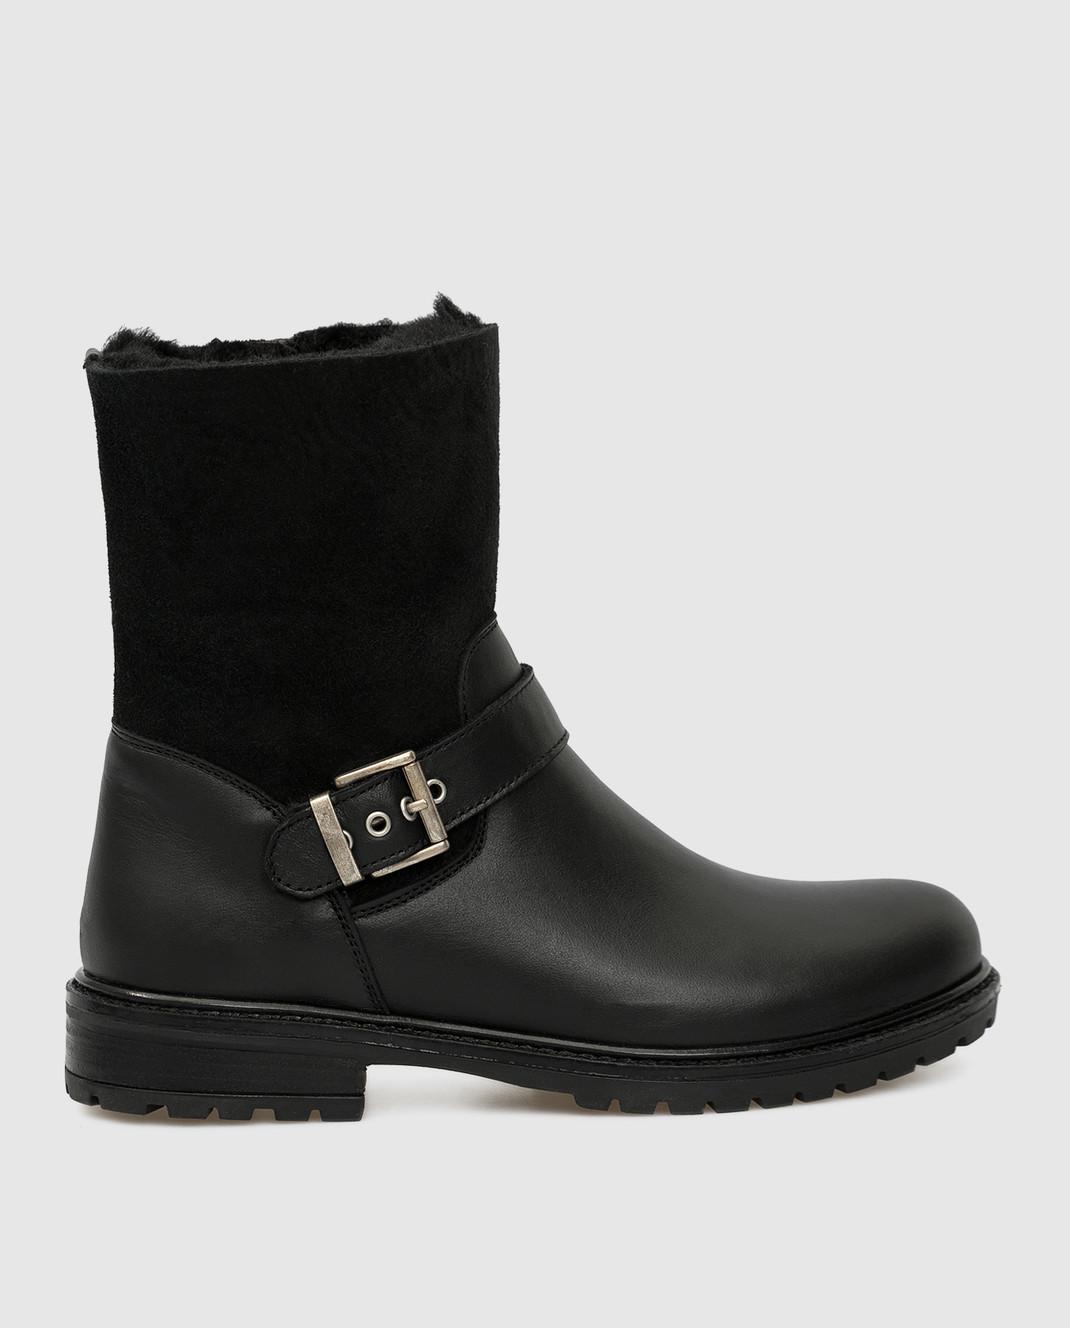 Zecchino D'oro Детские черные сапоги F0242563032